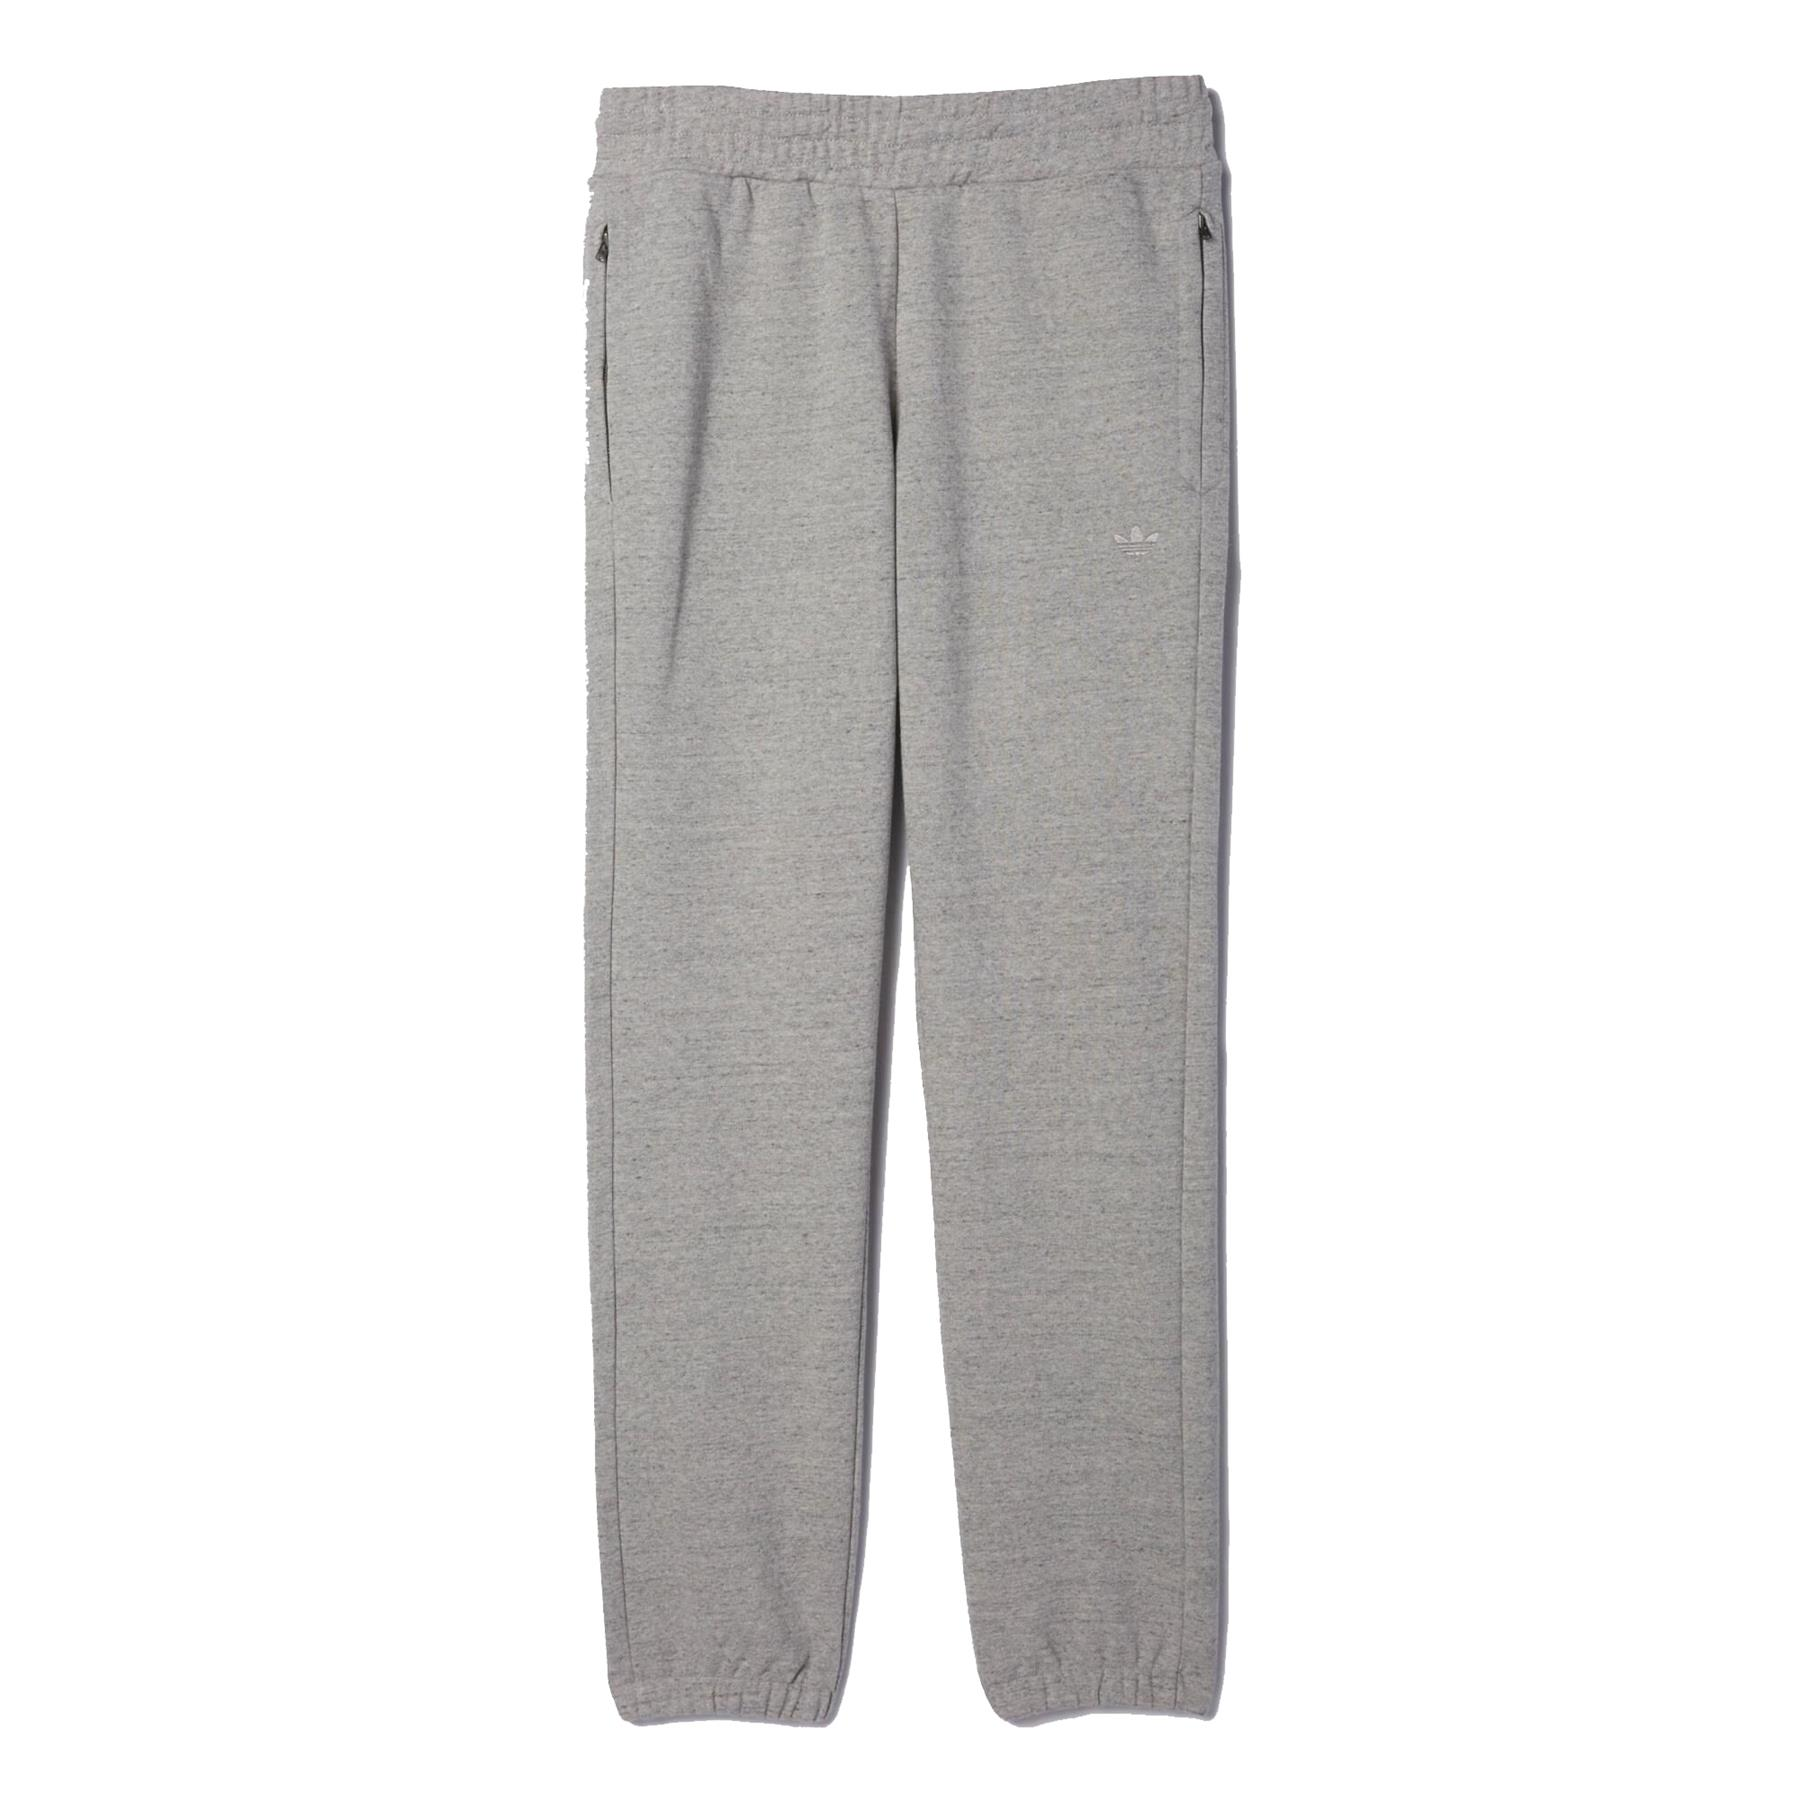 pantaloni adidas donna tuta grigi